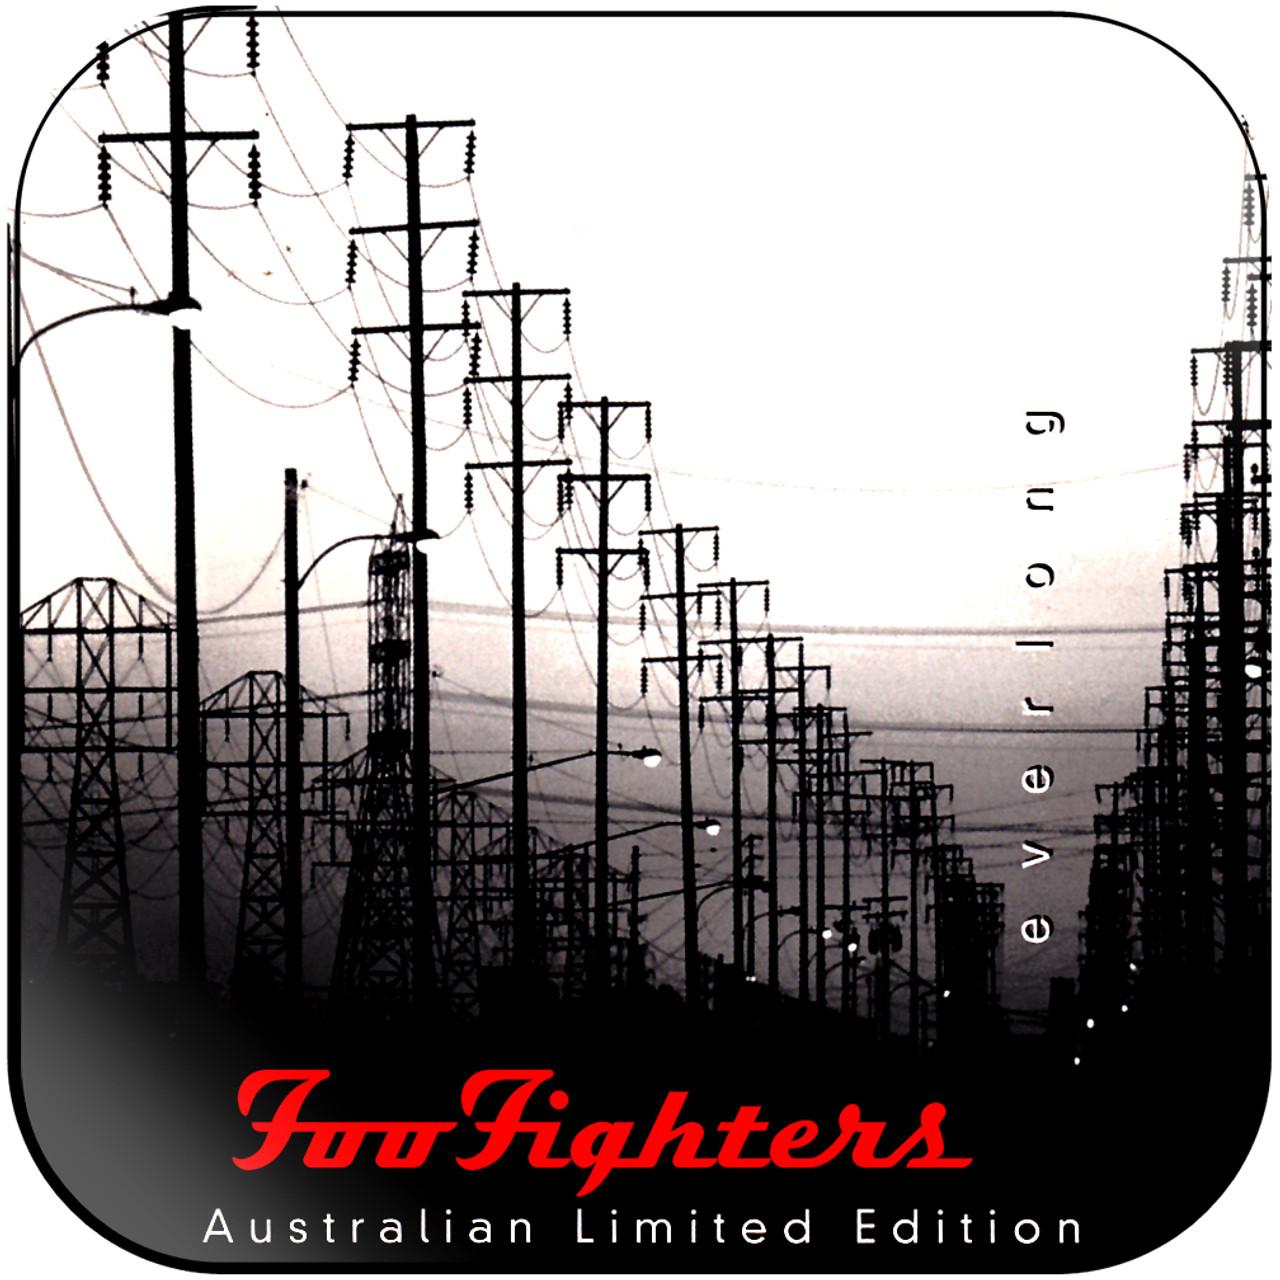 Foo Fighters Everlong 4 Album Cover Sticker